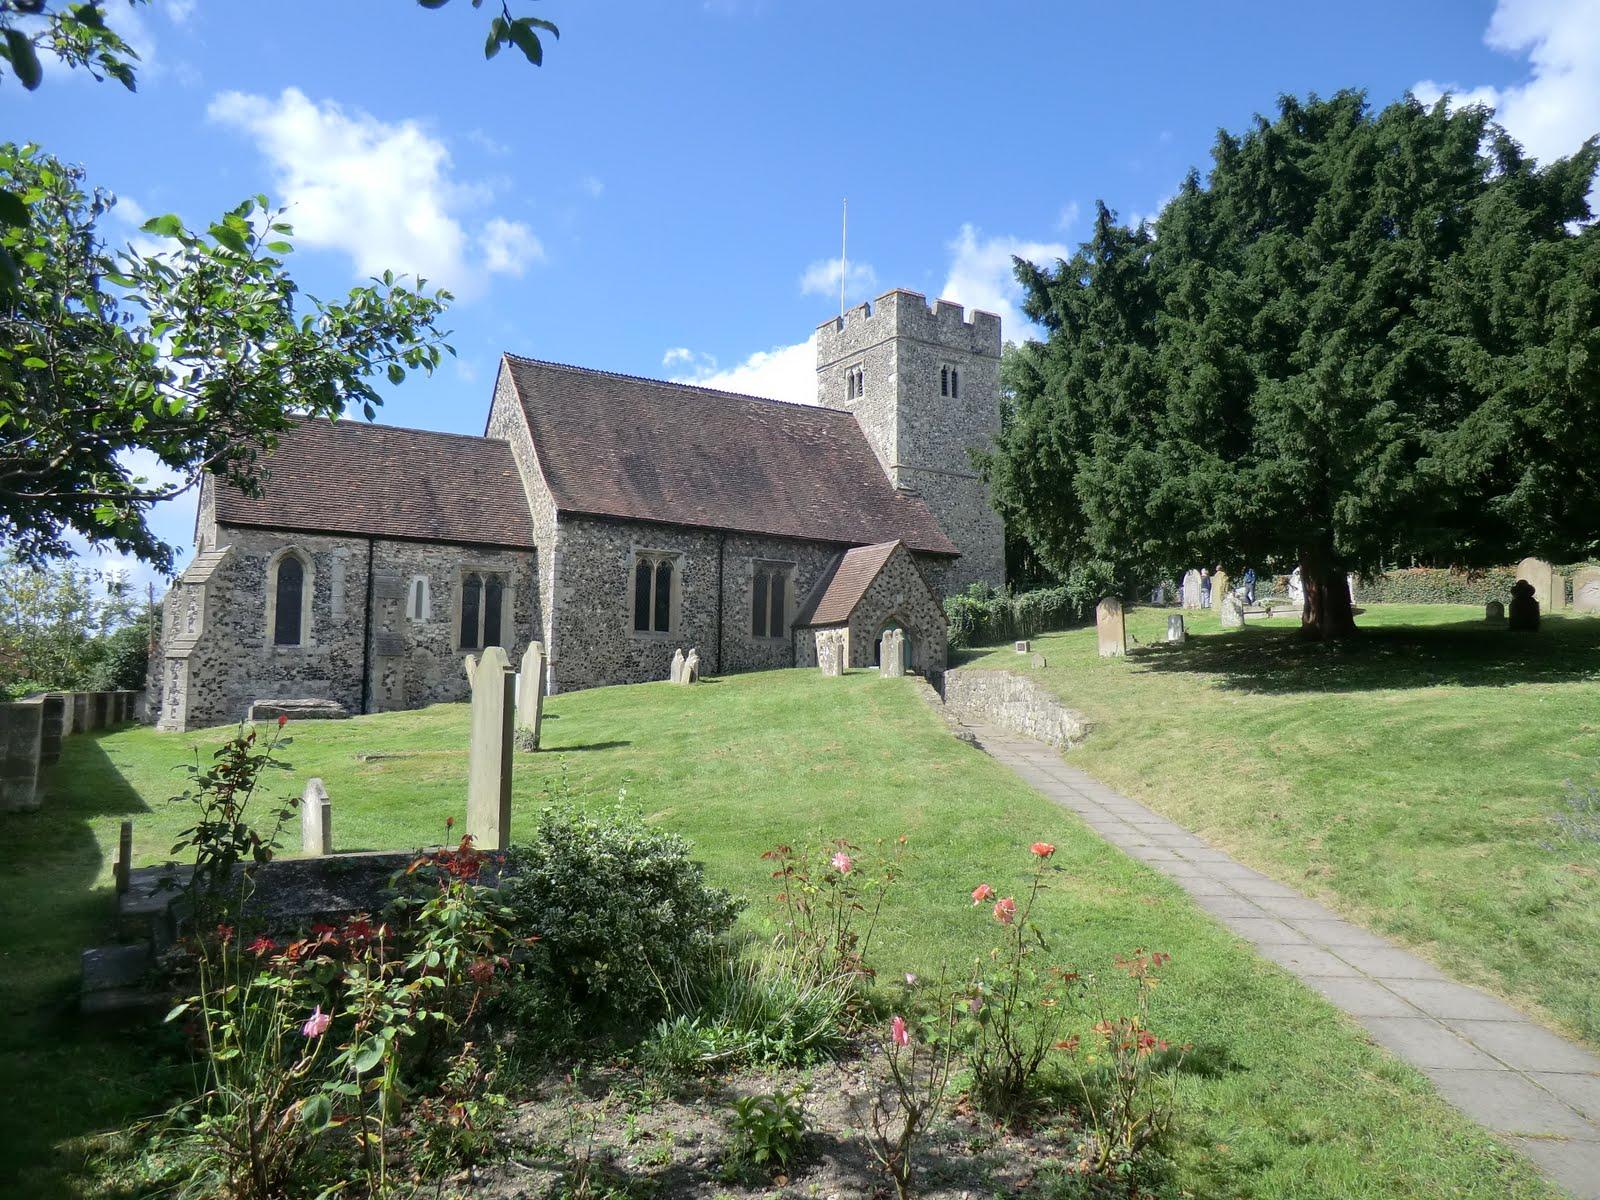 CIMG3470 St Michael and All Angels church, Cuxton